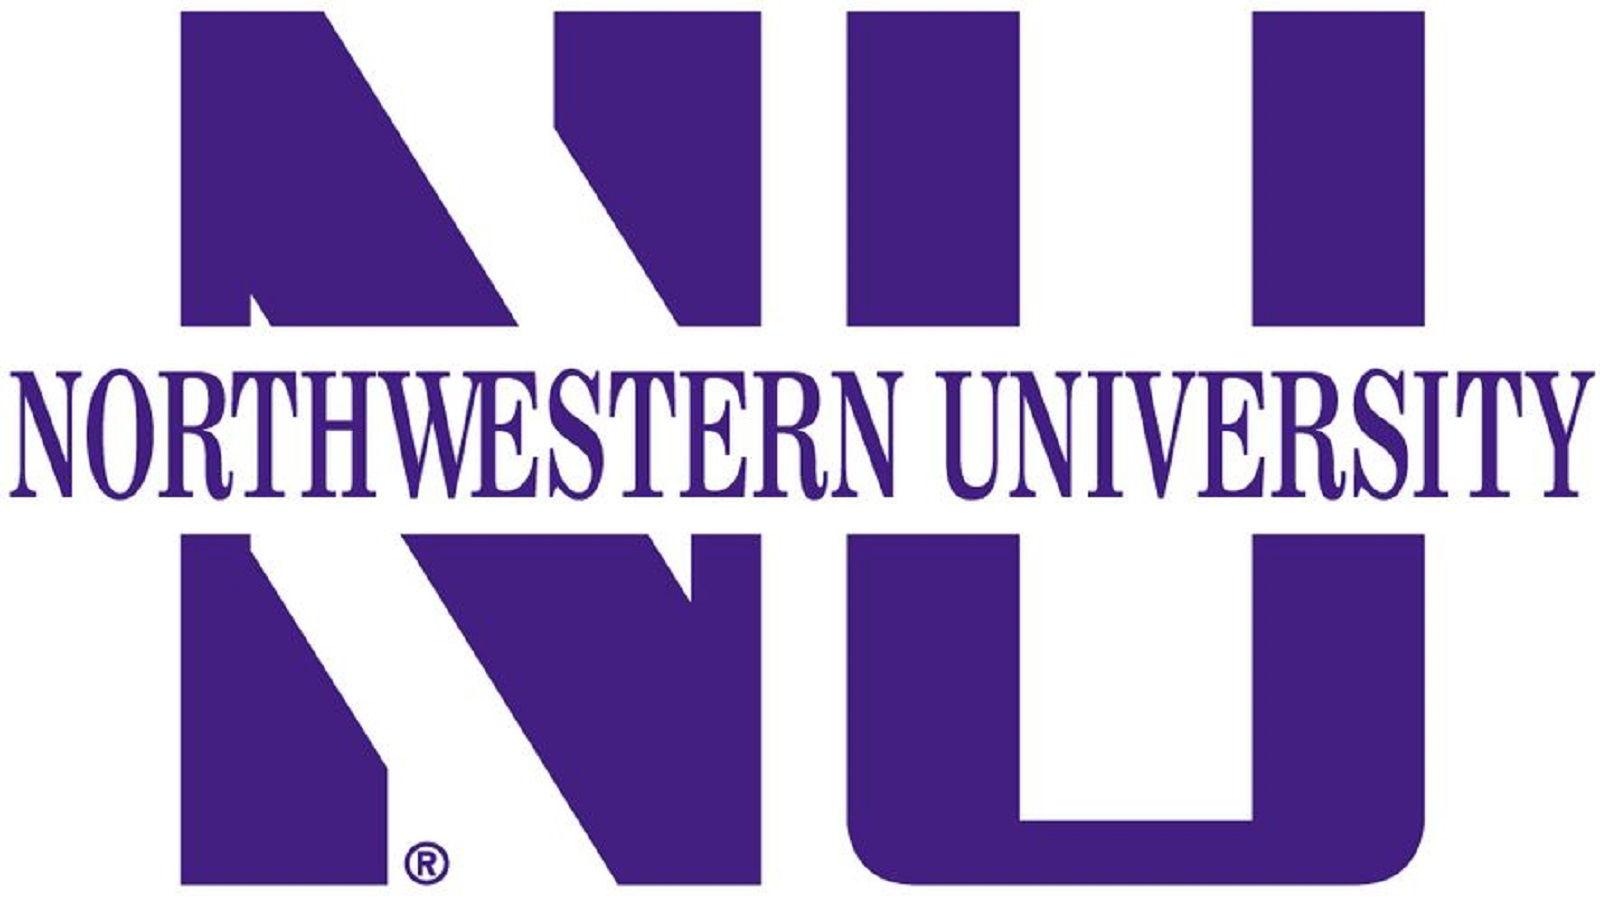 Northwestern University Master's in Data Science Online